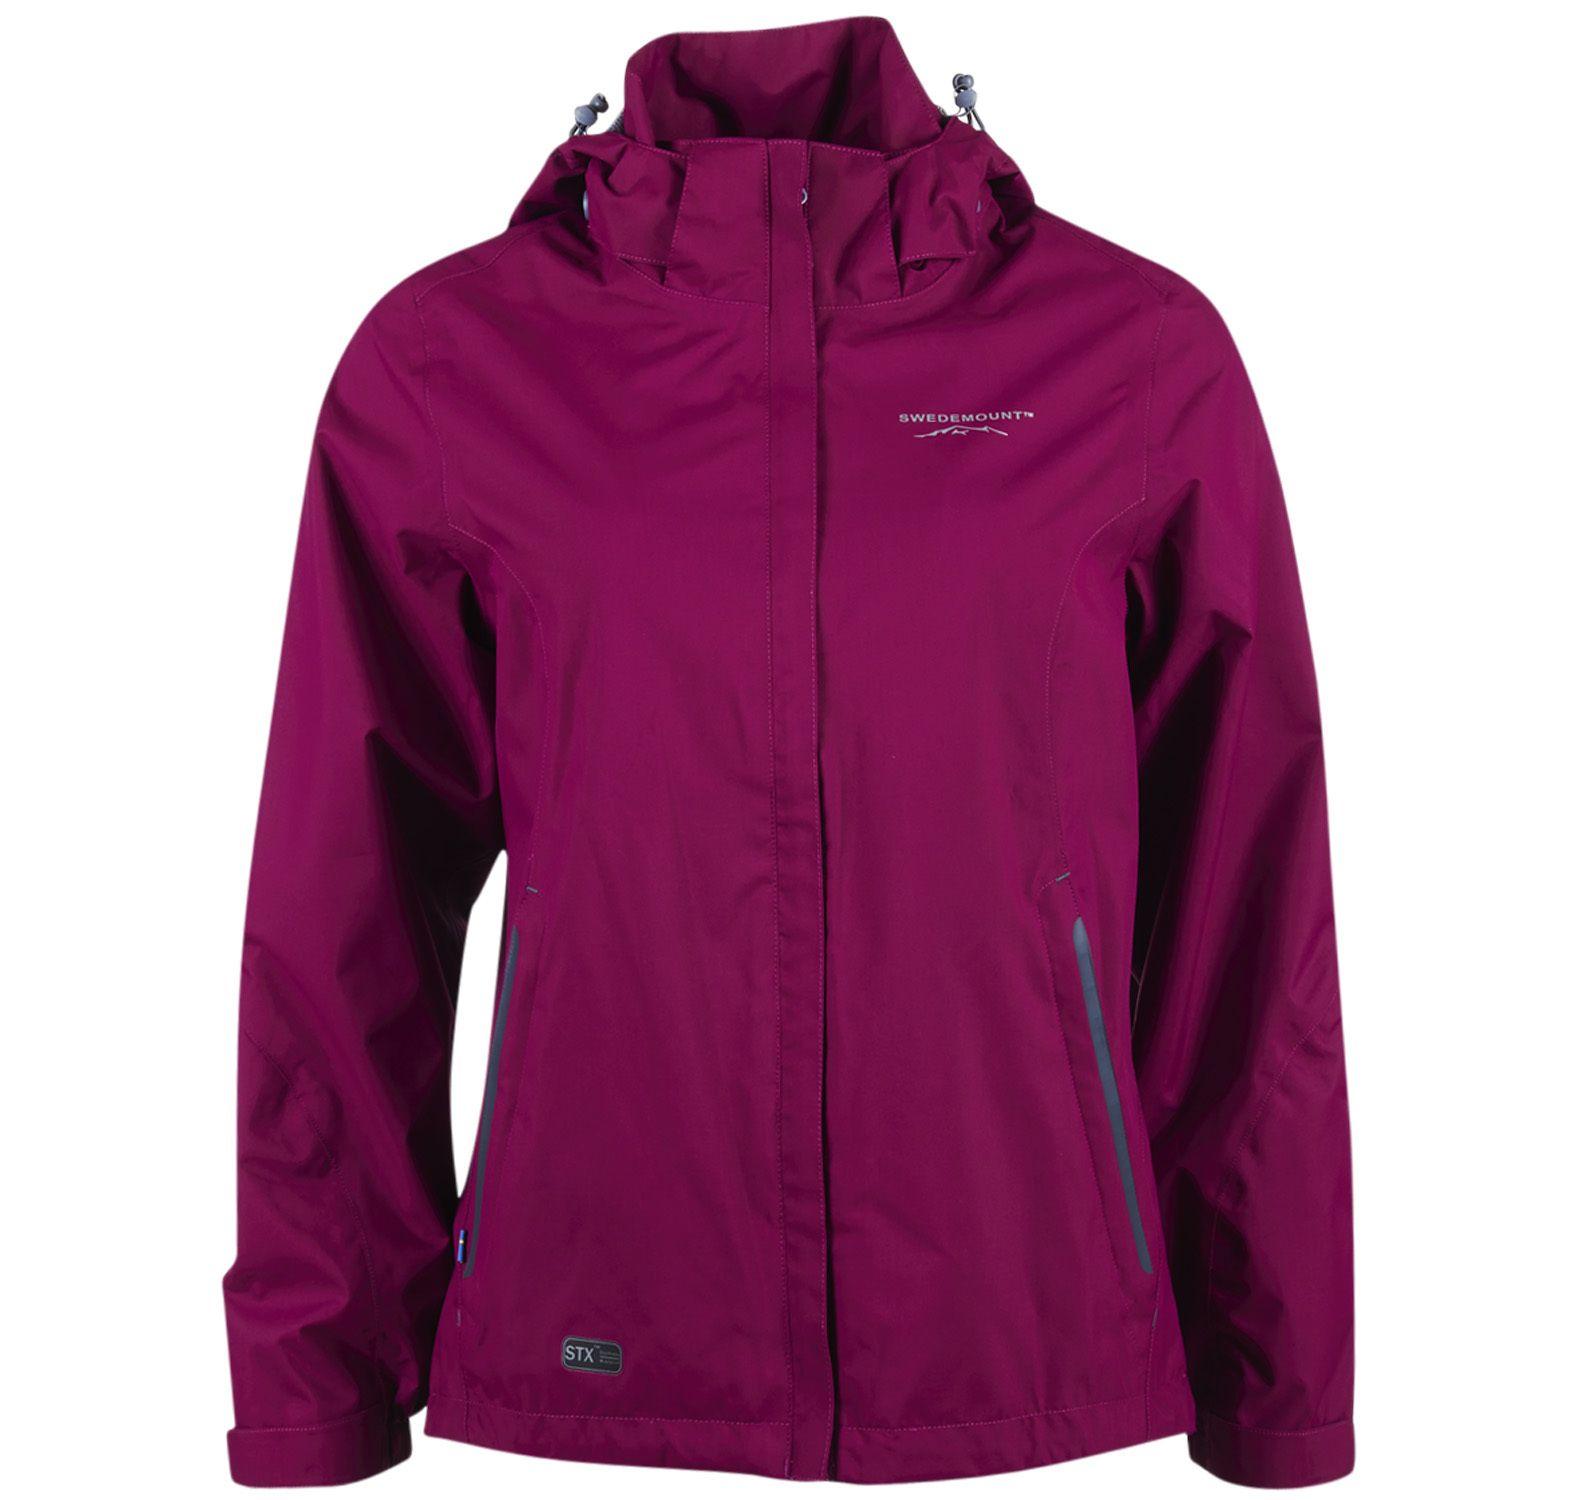 käringön jacket w, purple, 36, regnkläder